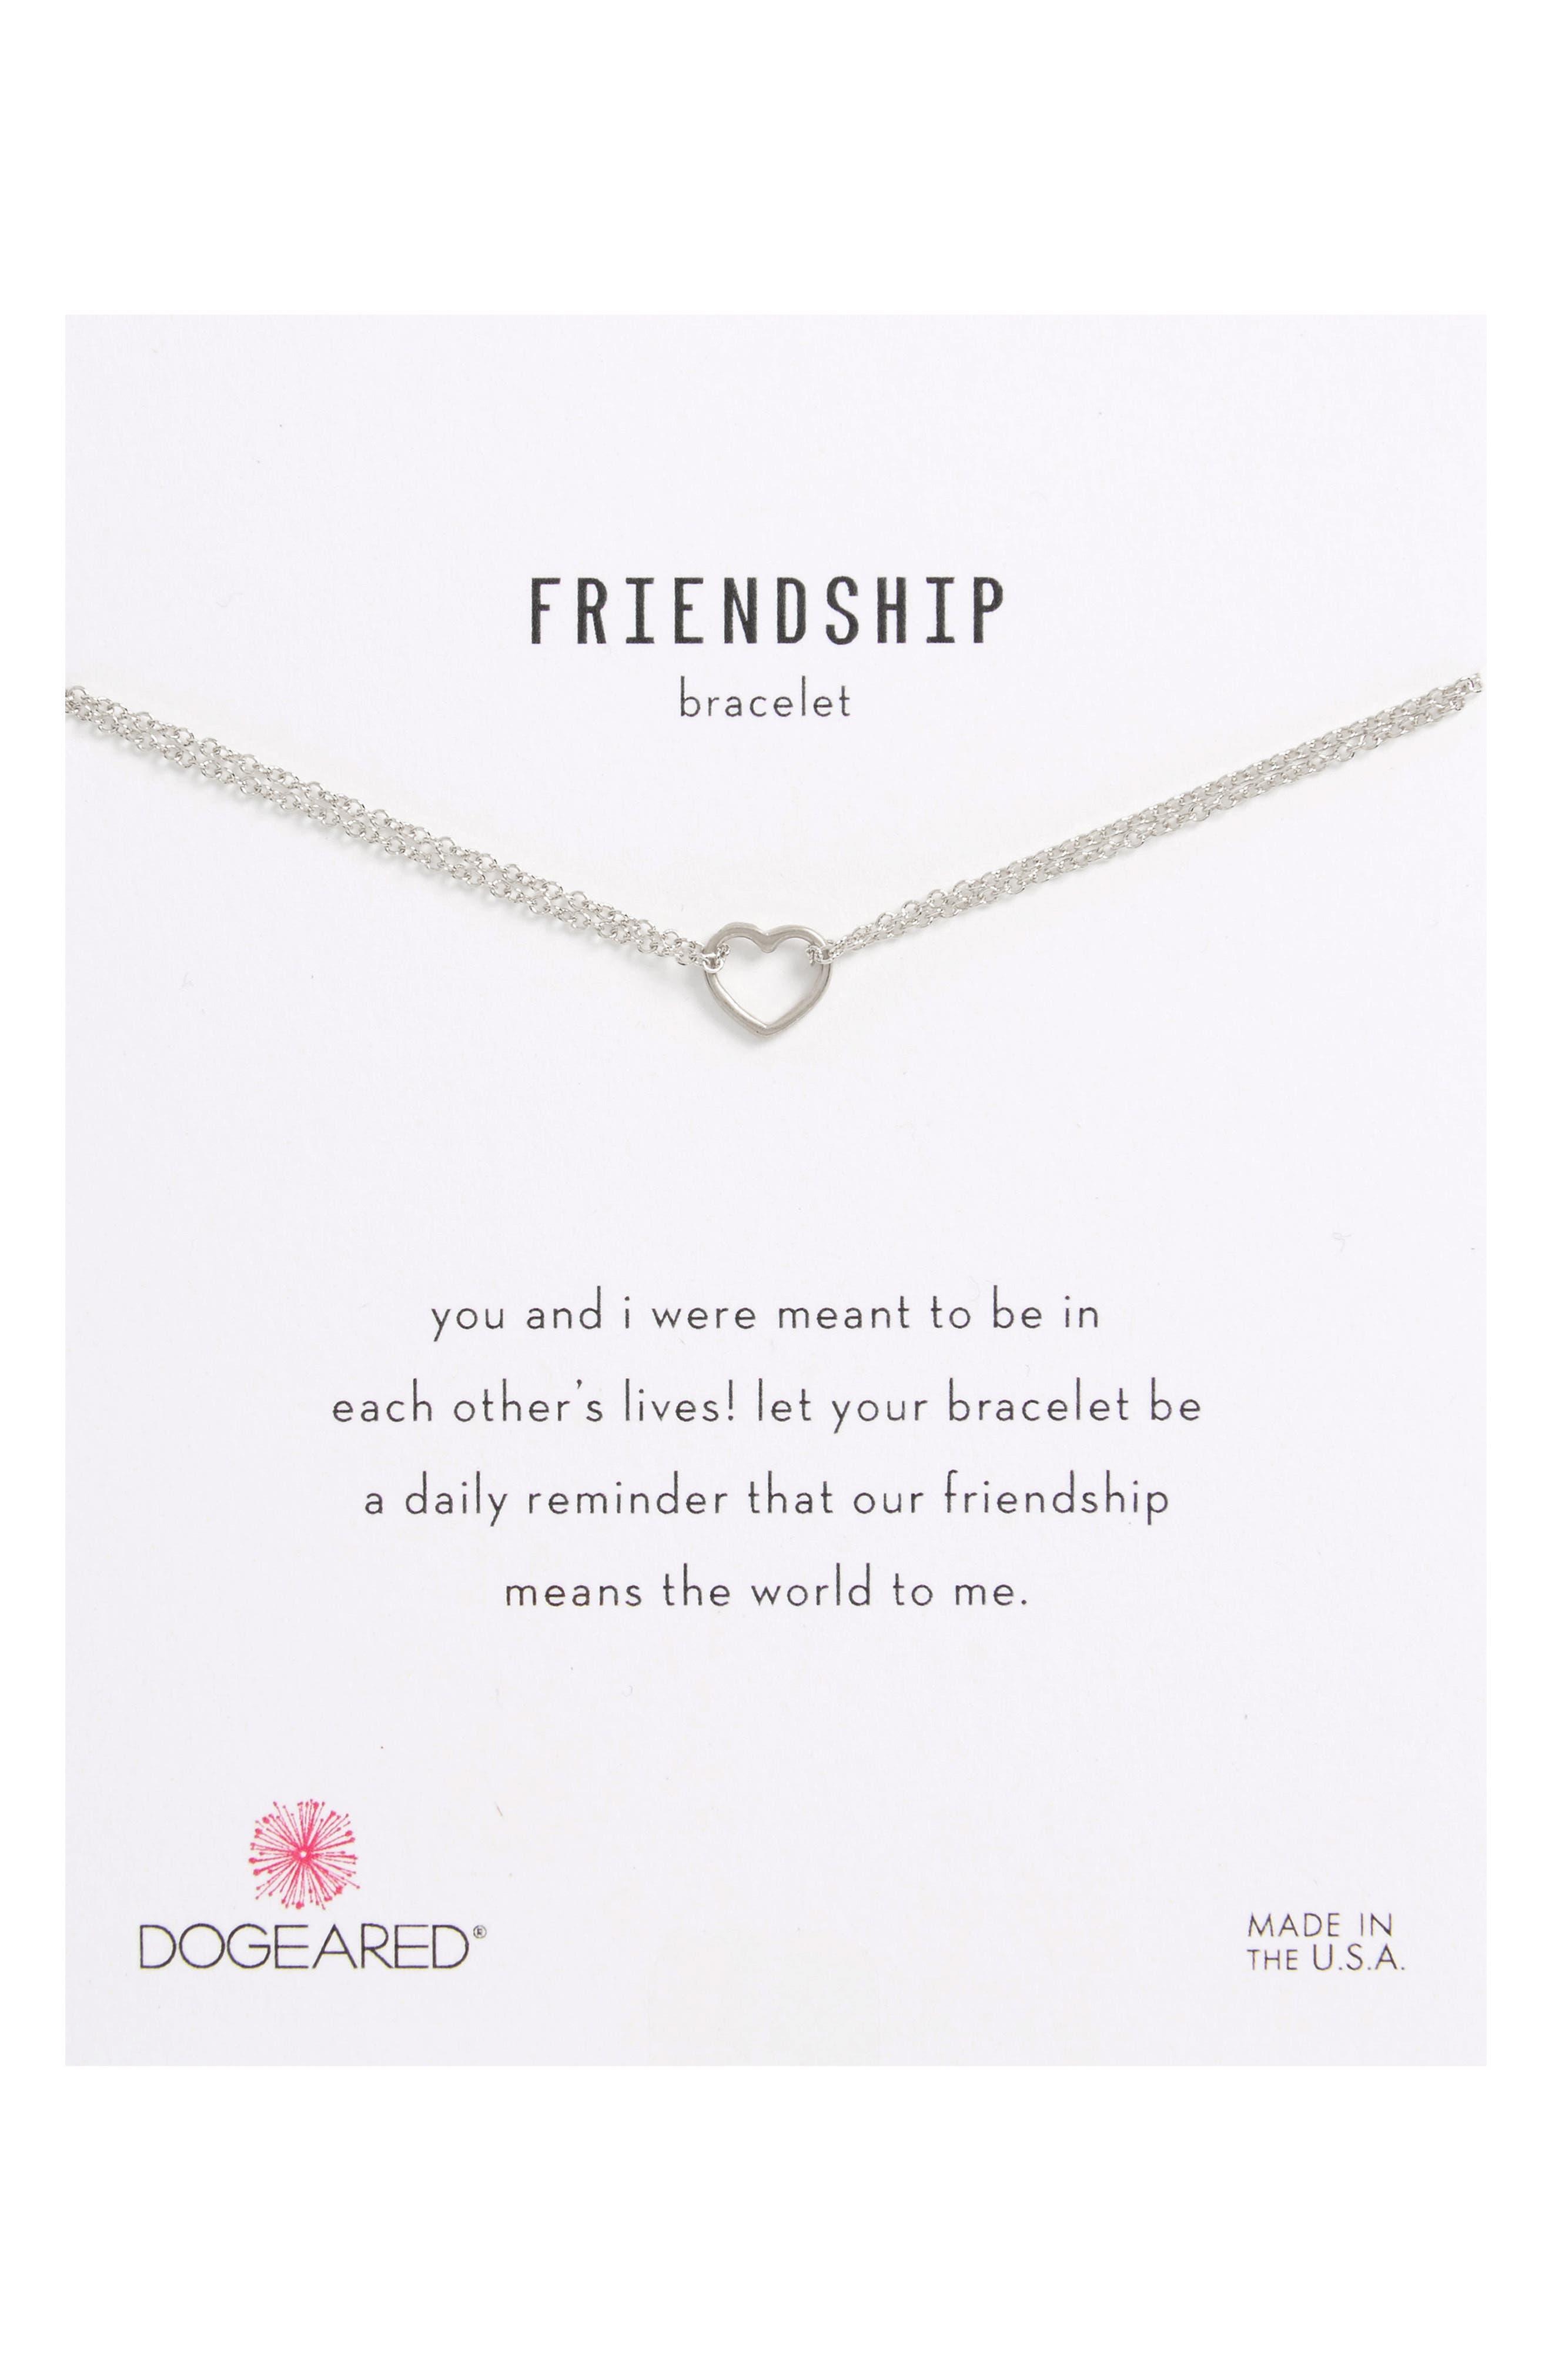 Friendship Small Open Heart Charm Chain Bracelet,                             Main thumbnail 1, color,                             040